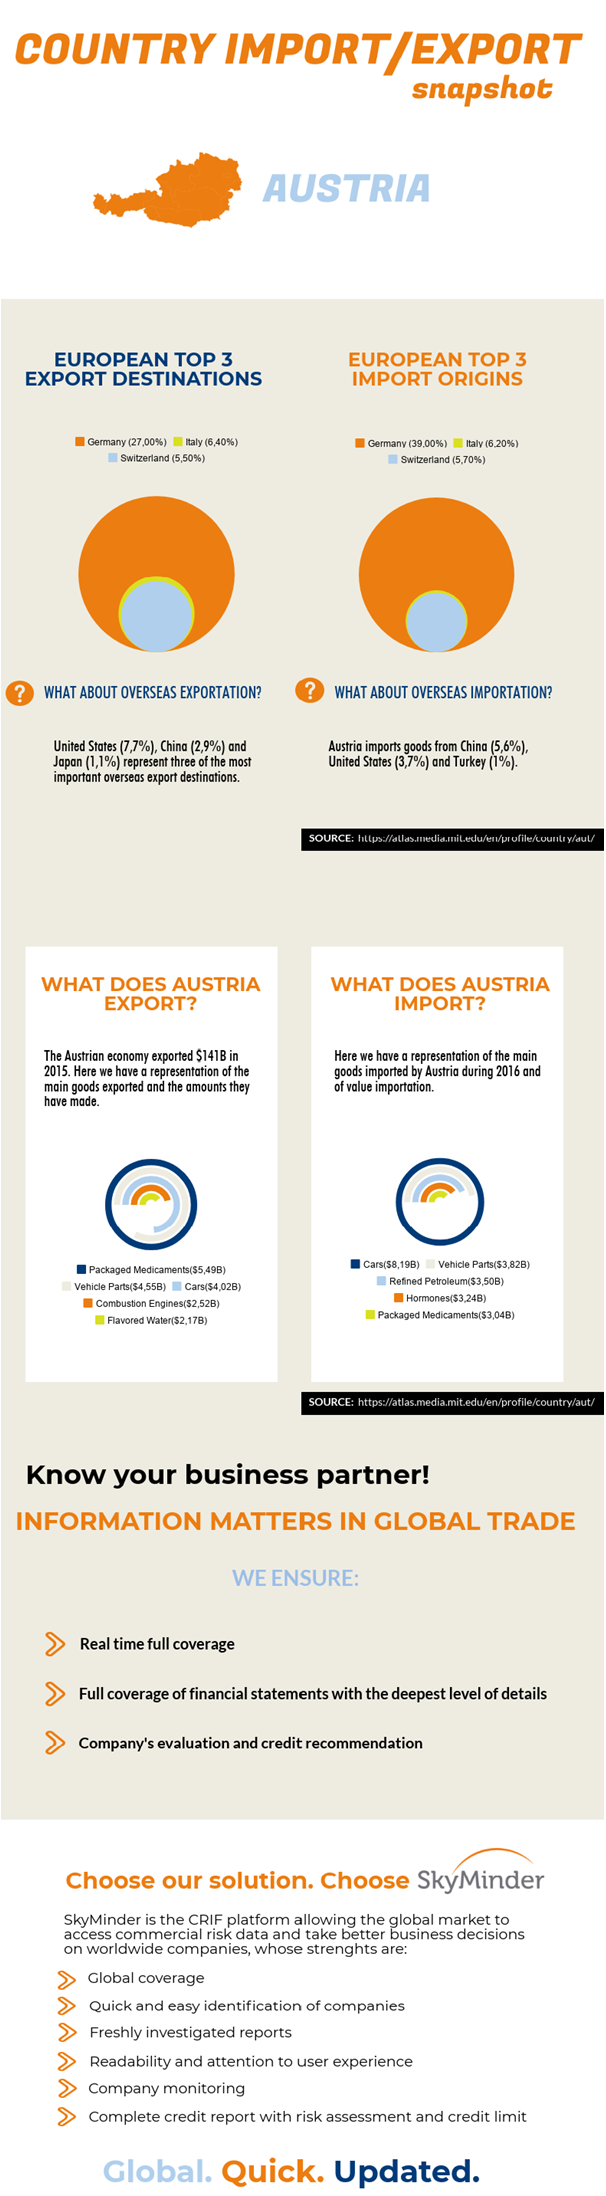 Austrian import/export